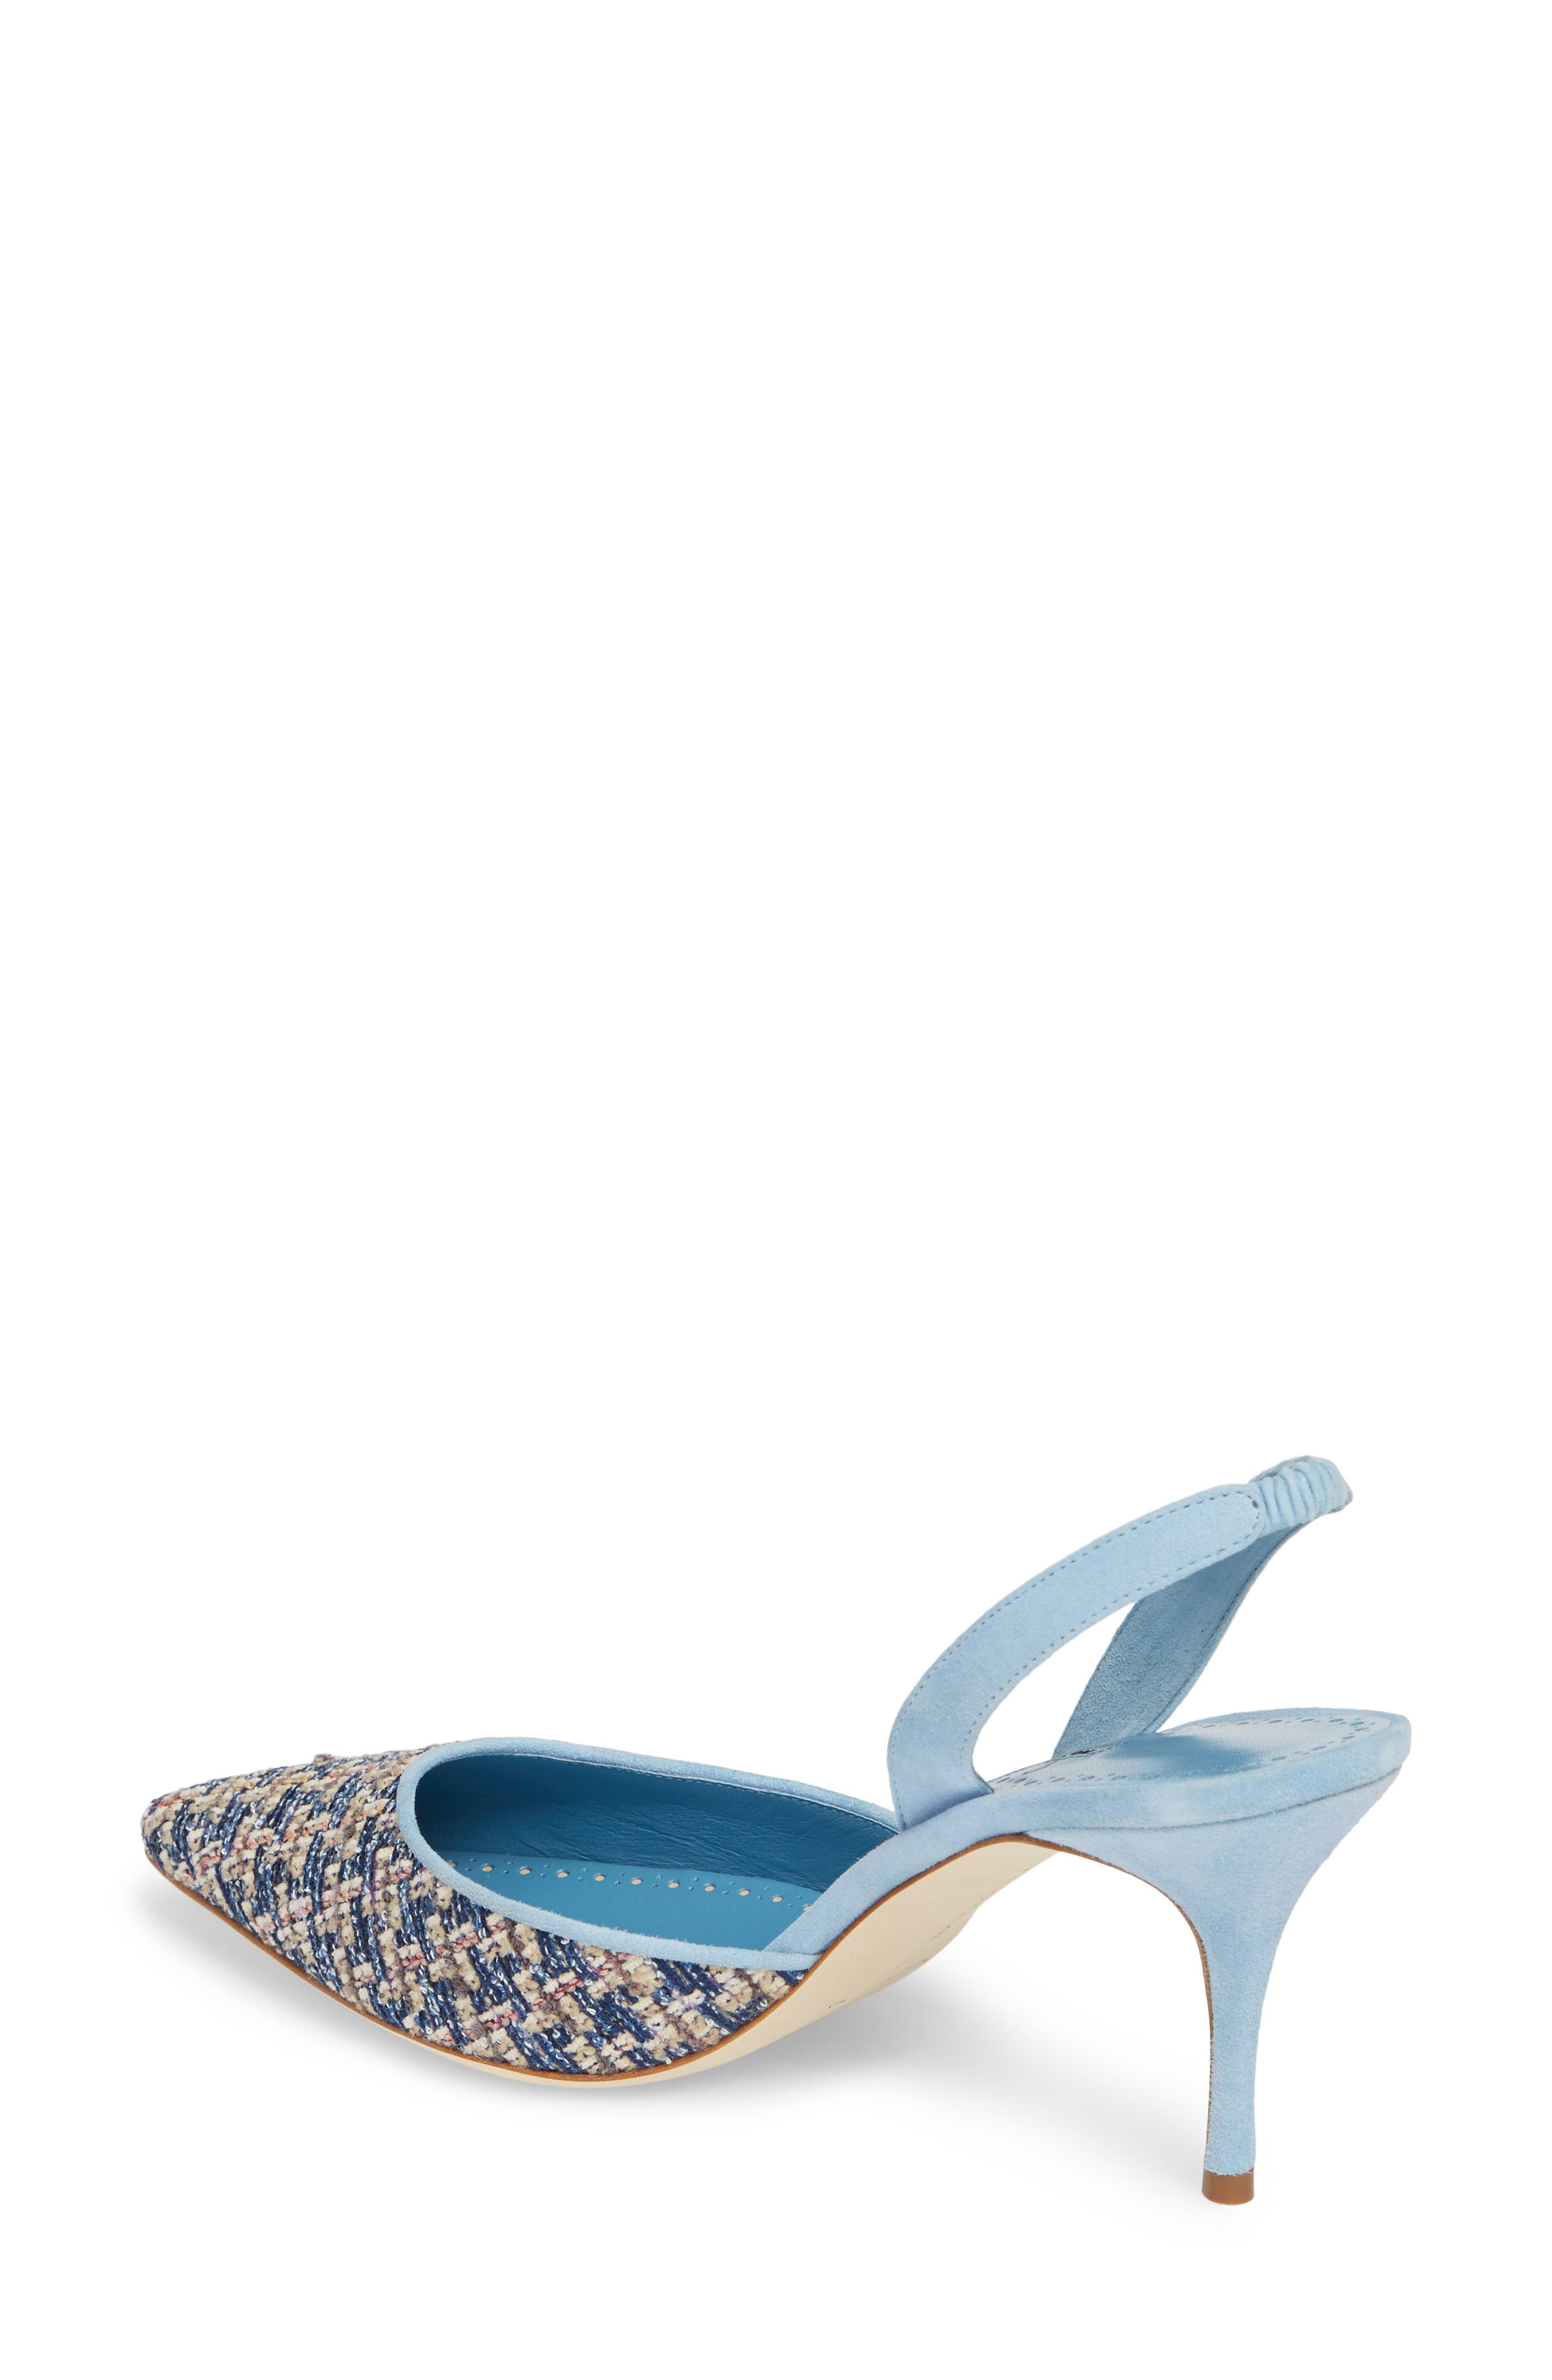 'Carolyne' Pointy Toe Slingback Pump,                             Alternate thumbnail 2, color,                             Blue Tweed